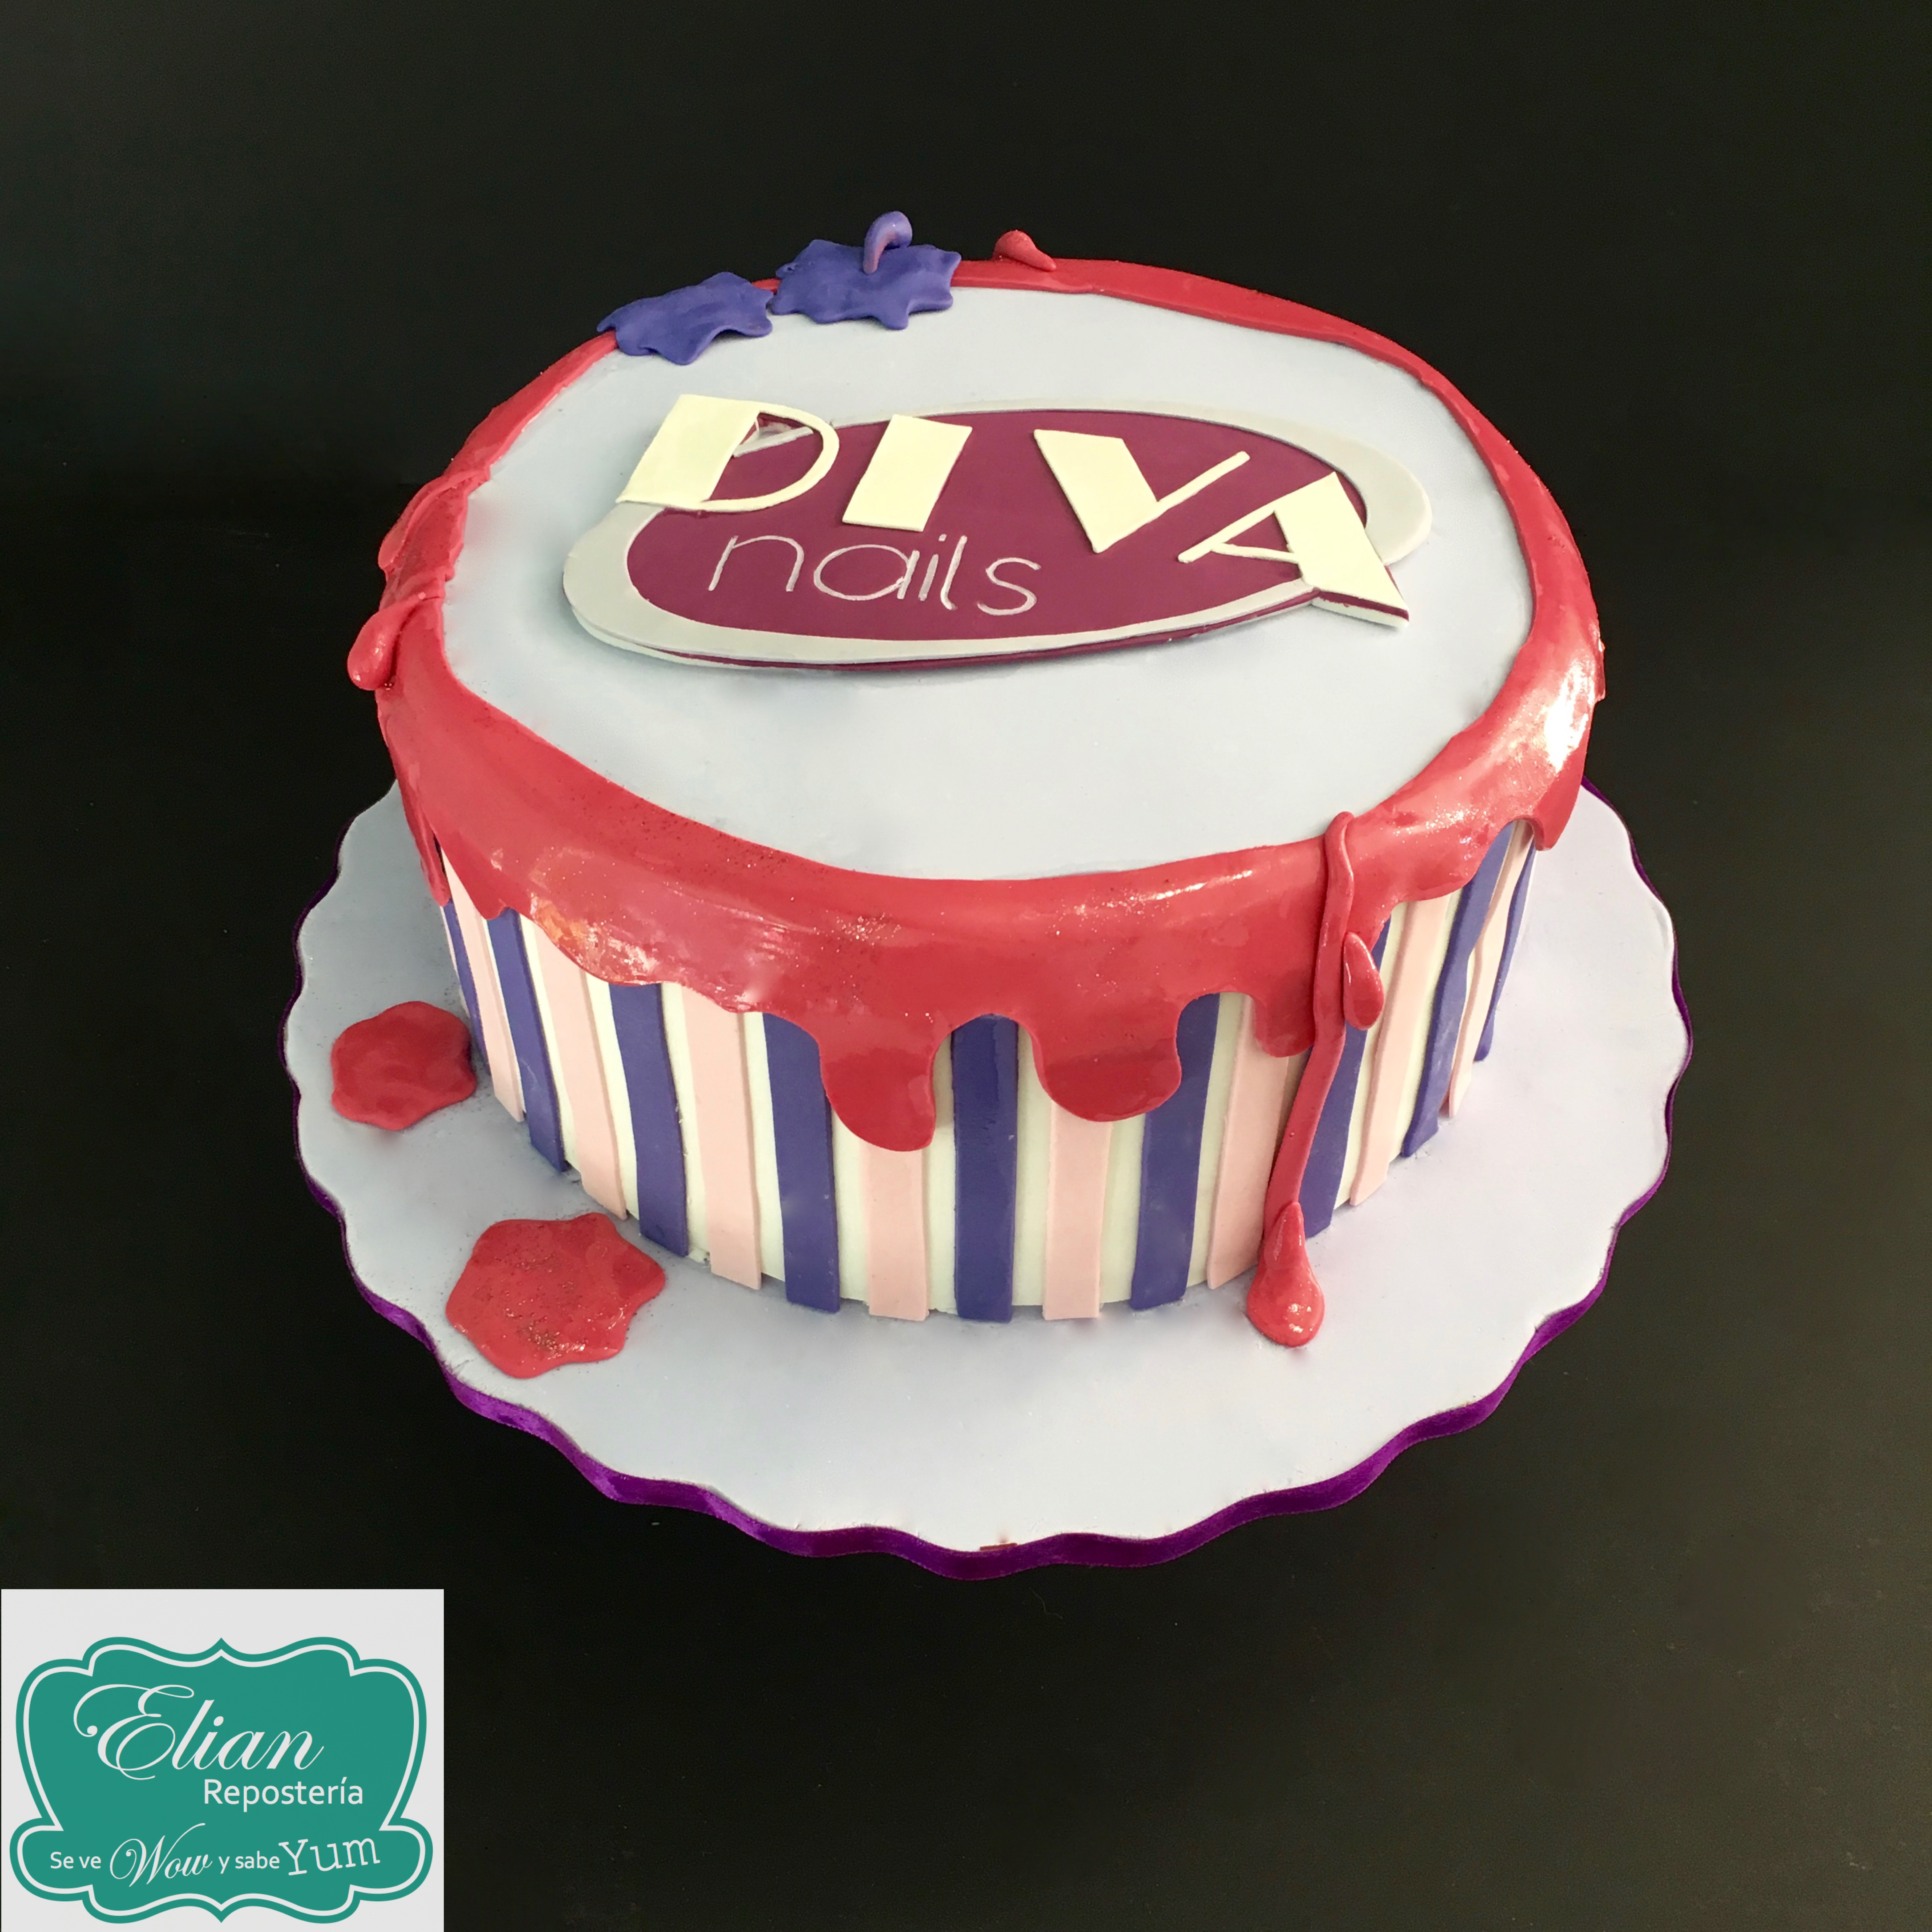 Diva Nails cake